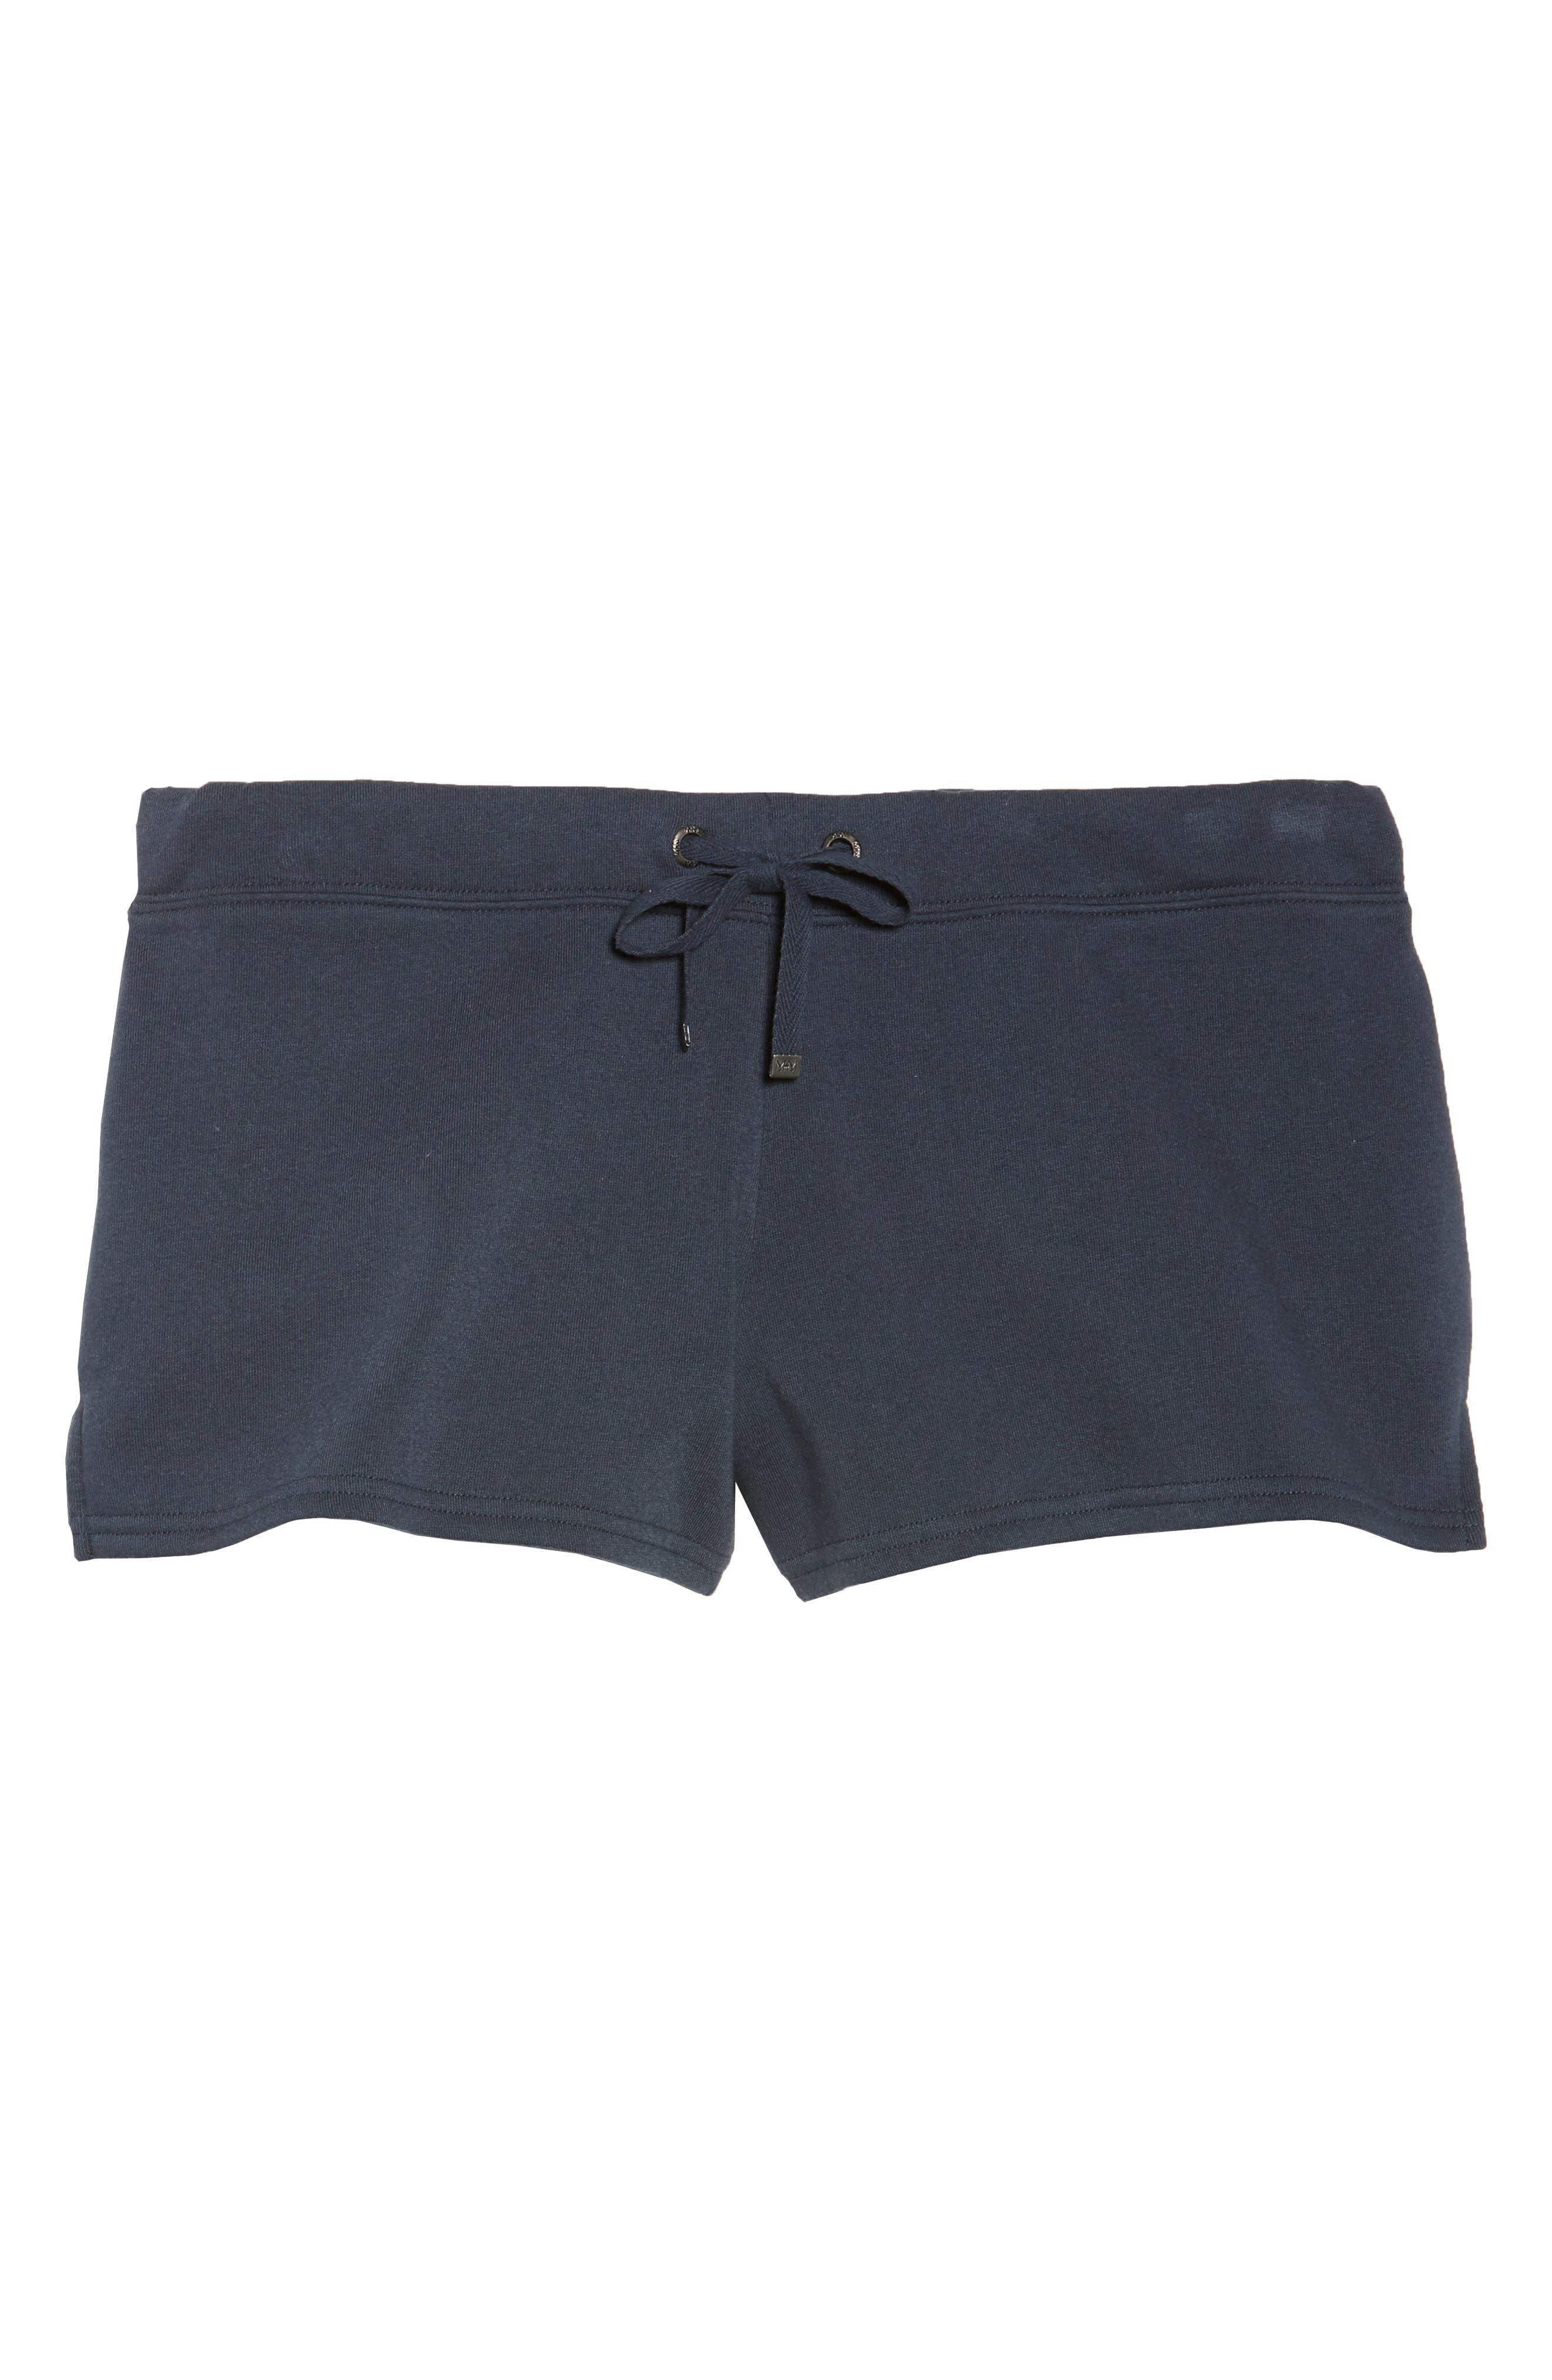 Take It Easy Lounge Shorts,                             Alternate thumbnail 4, color,                             Navy Blue